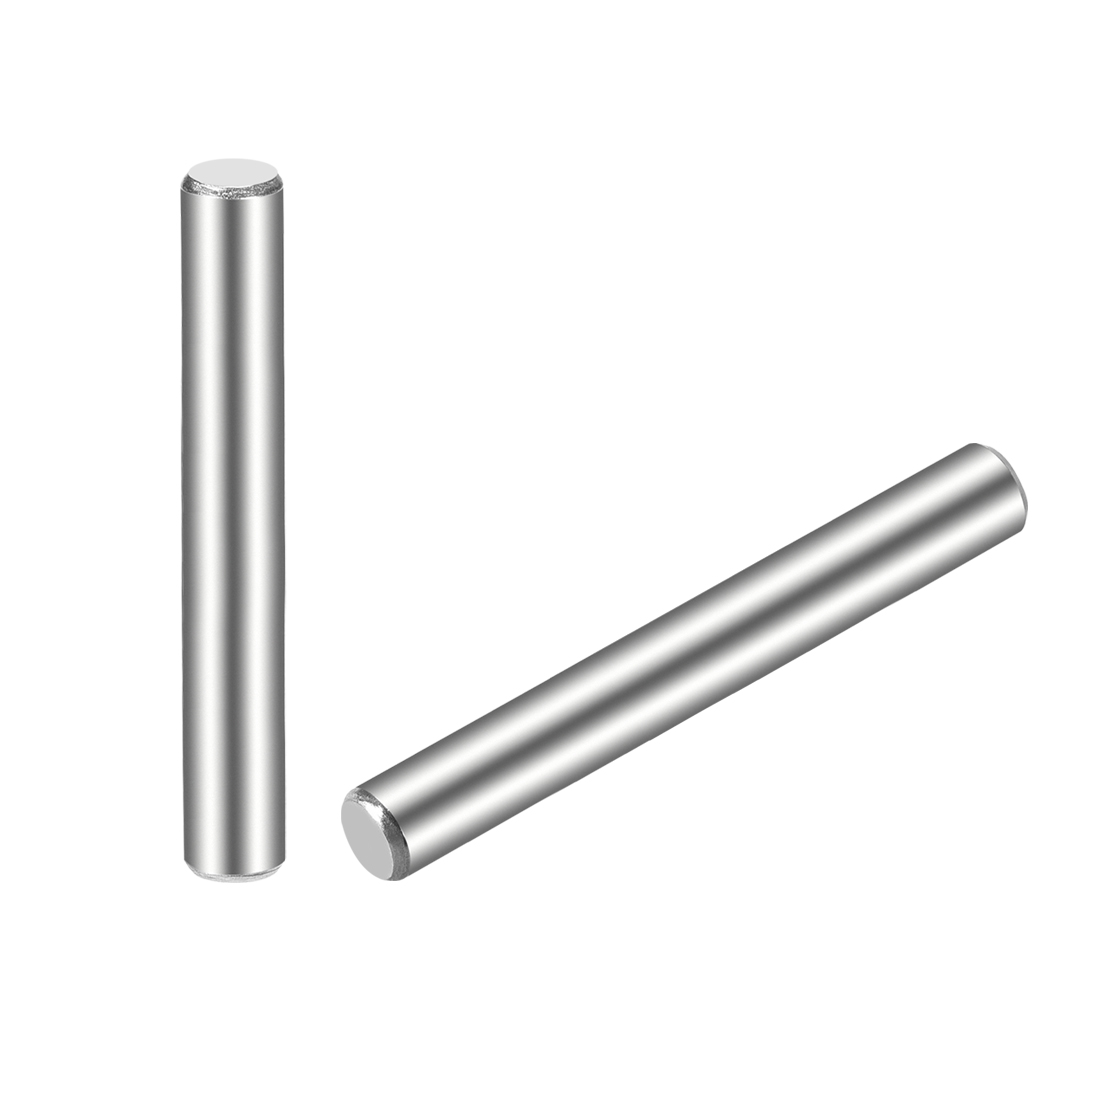 25Pcs 5mm x 50mm Dowel Pin 304 Stainless Steel Shelf Support Pin Fasten